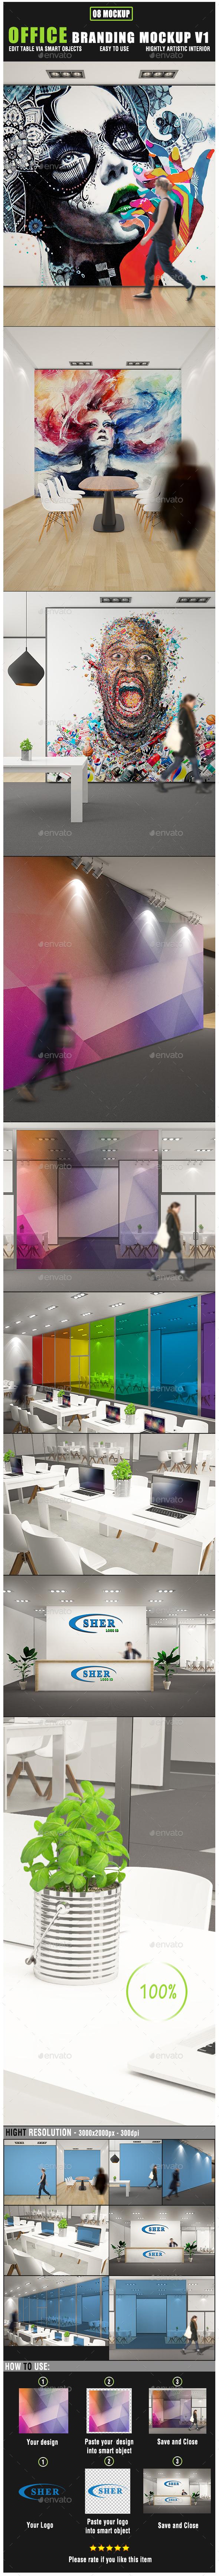 Office Branding Mockup V1 - Posters Print